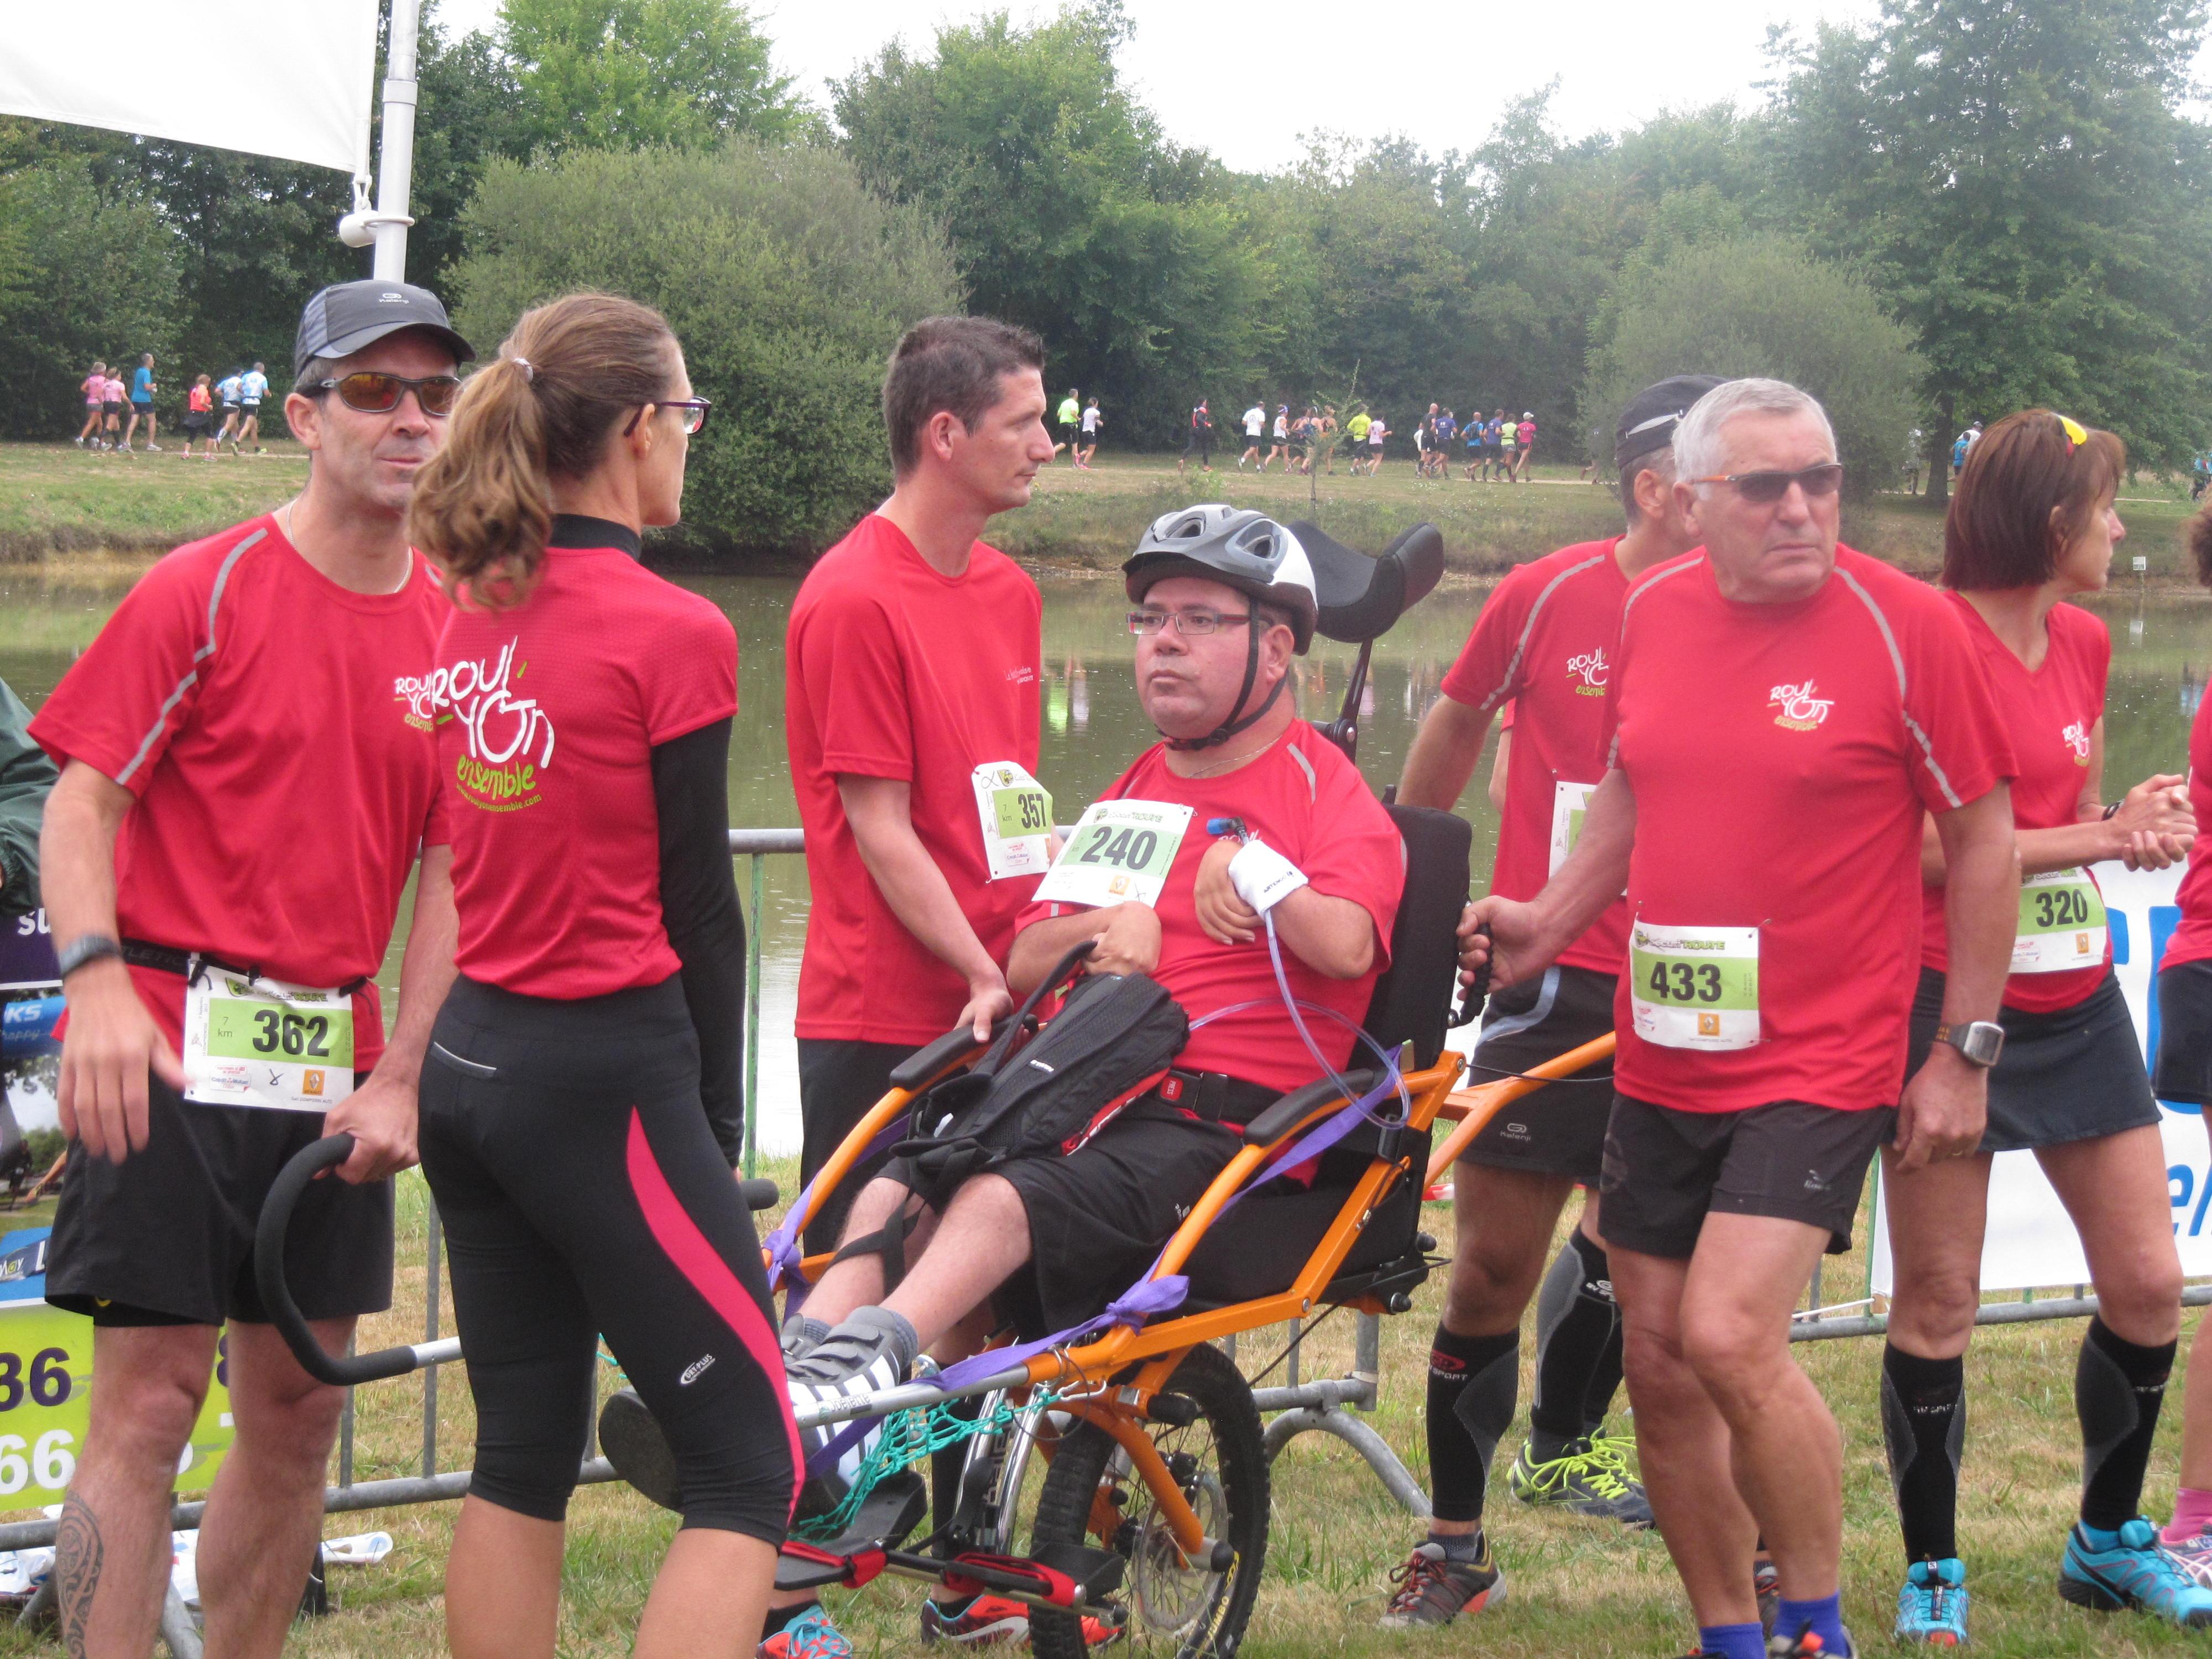 06 - Dompierre brief avant course - Hugues